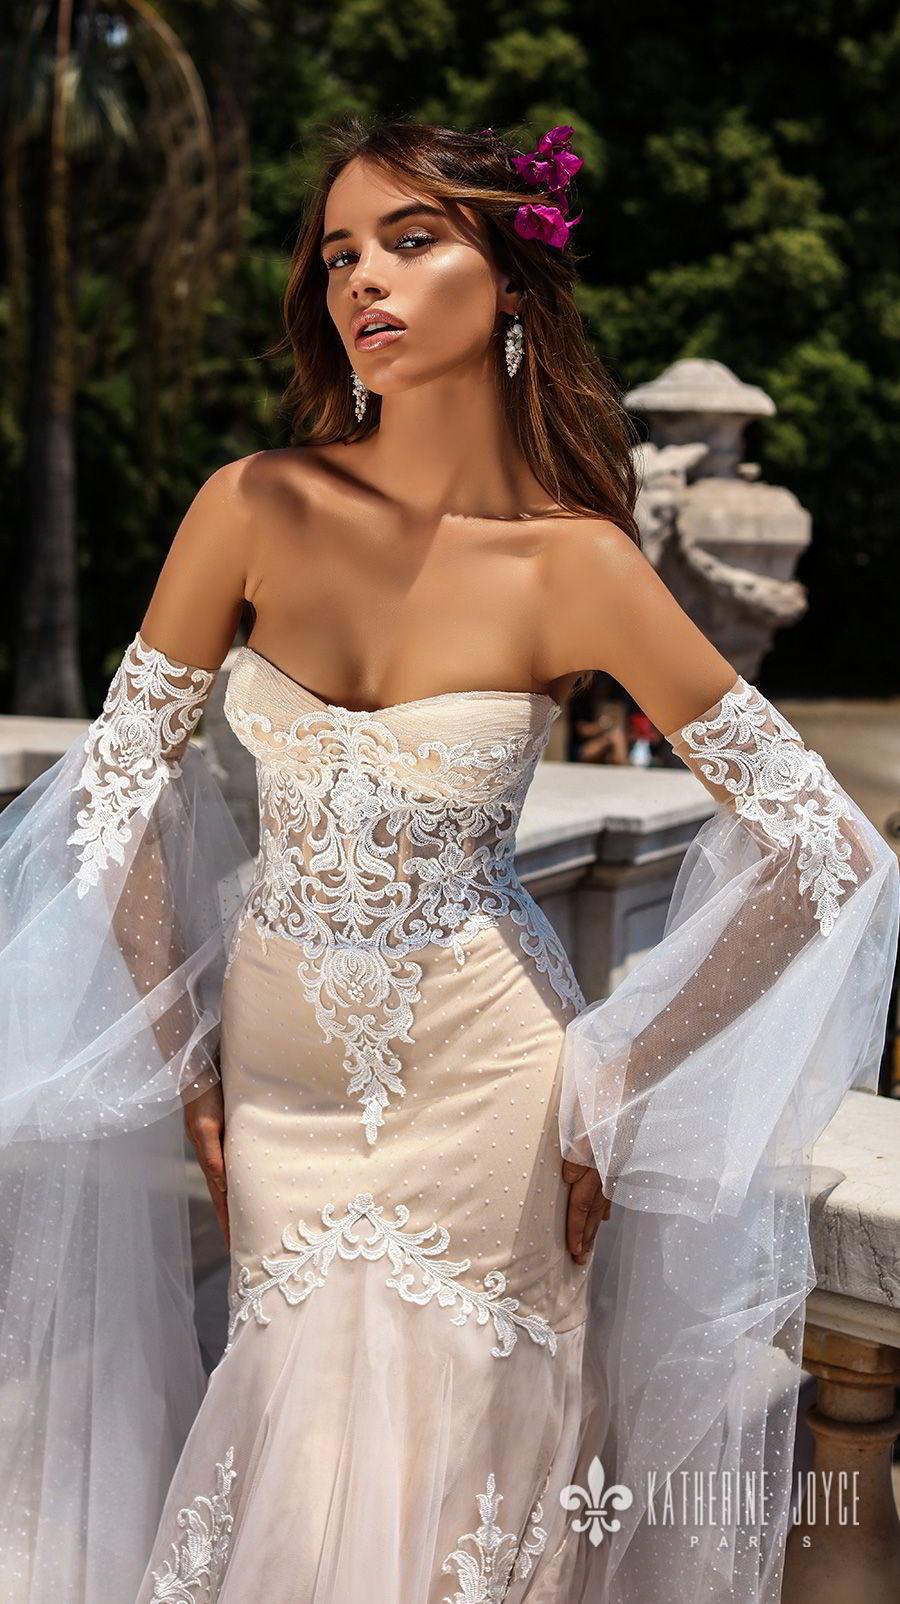 katherine joyce 2018 bridal long sleeves strapless sweetheart neckline heavily embellished bodice elegant sexy ivory fit and flare wedding dress chapel train (leticia) zv